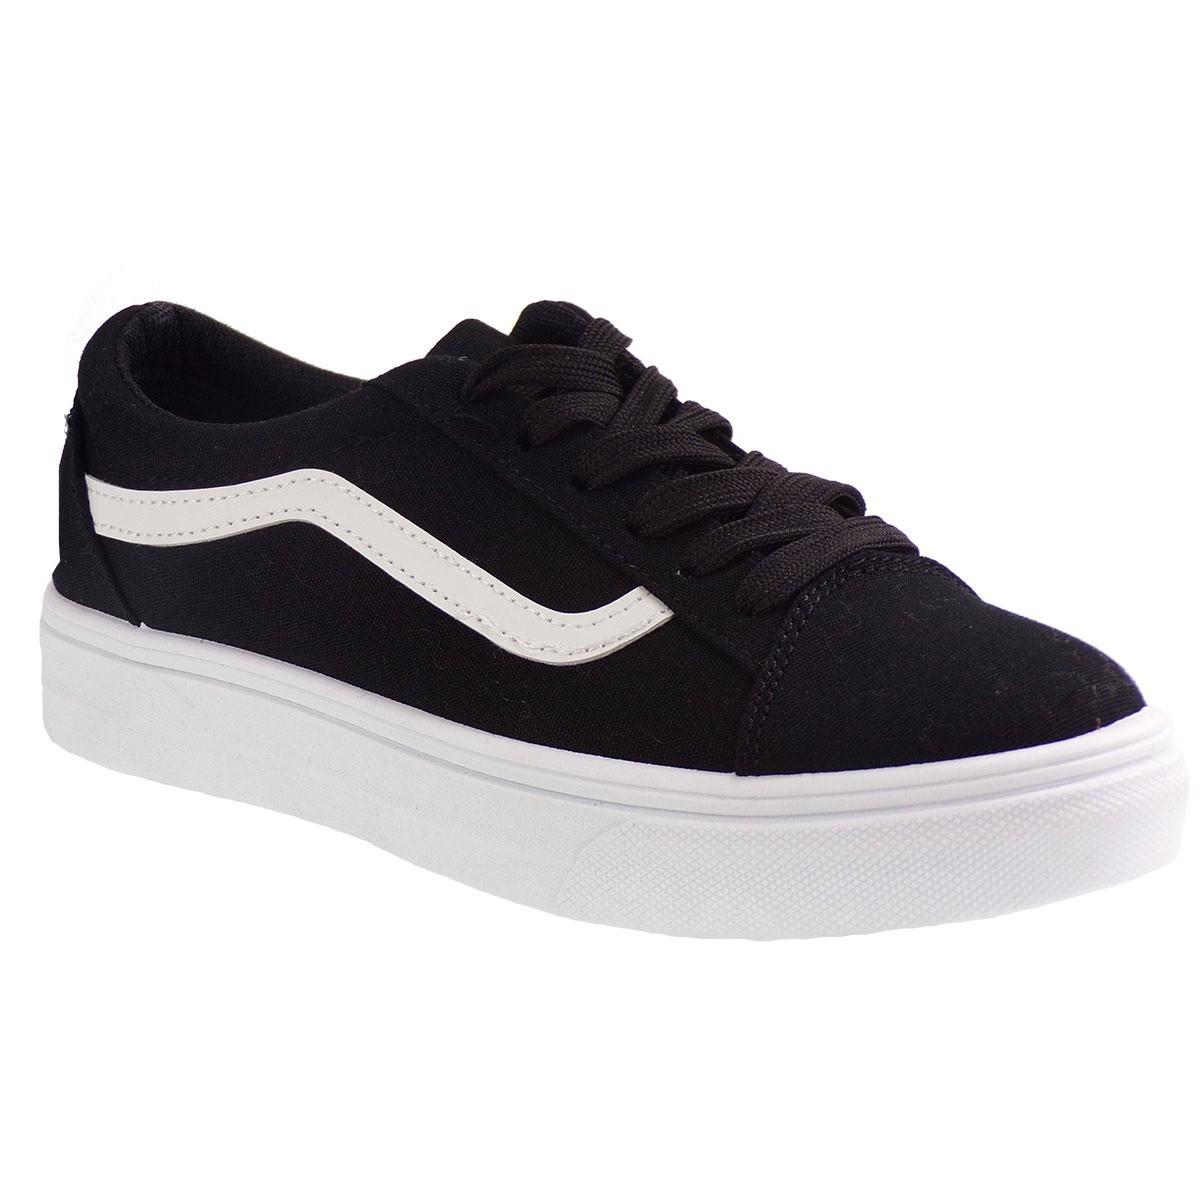 Bagiota Shoes Γυναικεία Παπούτσια Sneakers Αθλητικά MR-1909 Μαύρο